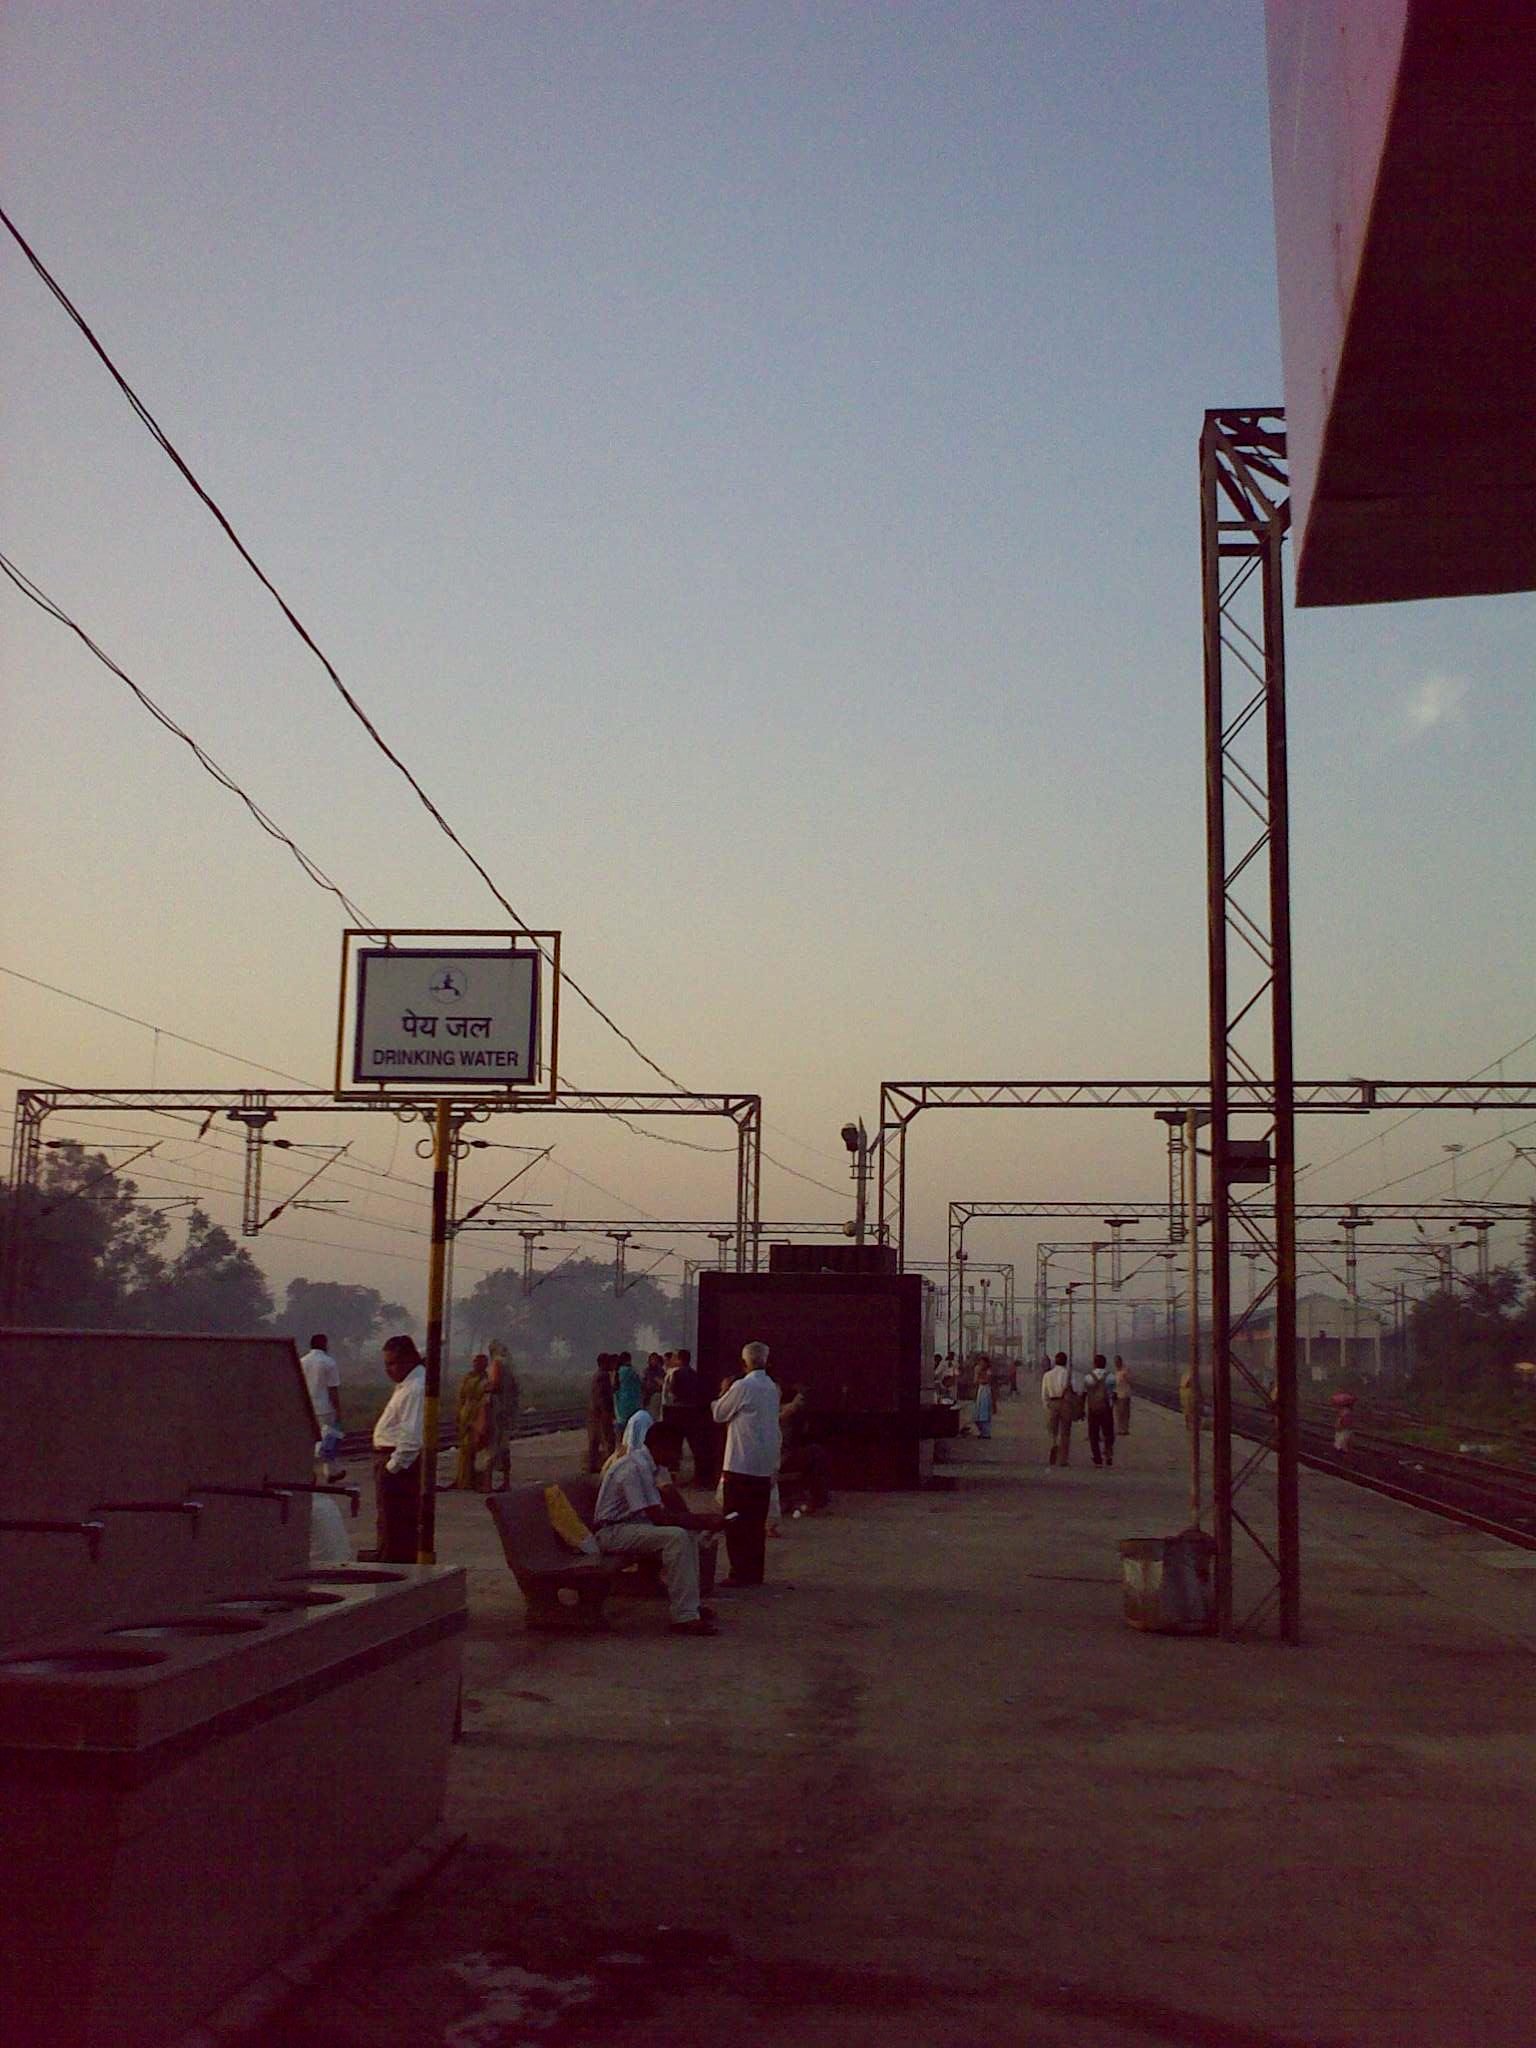 Nashik Road Railway Station, Early morning crowd waiting for the Panchvati Express to Mumbai.